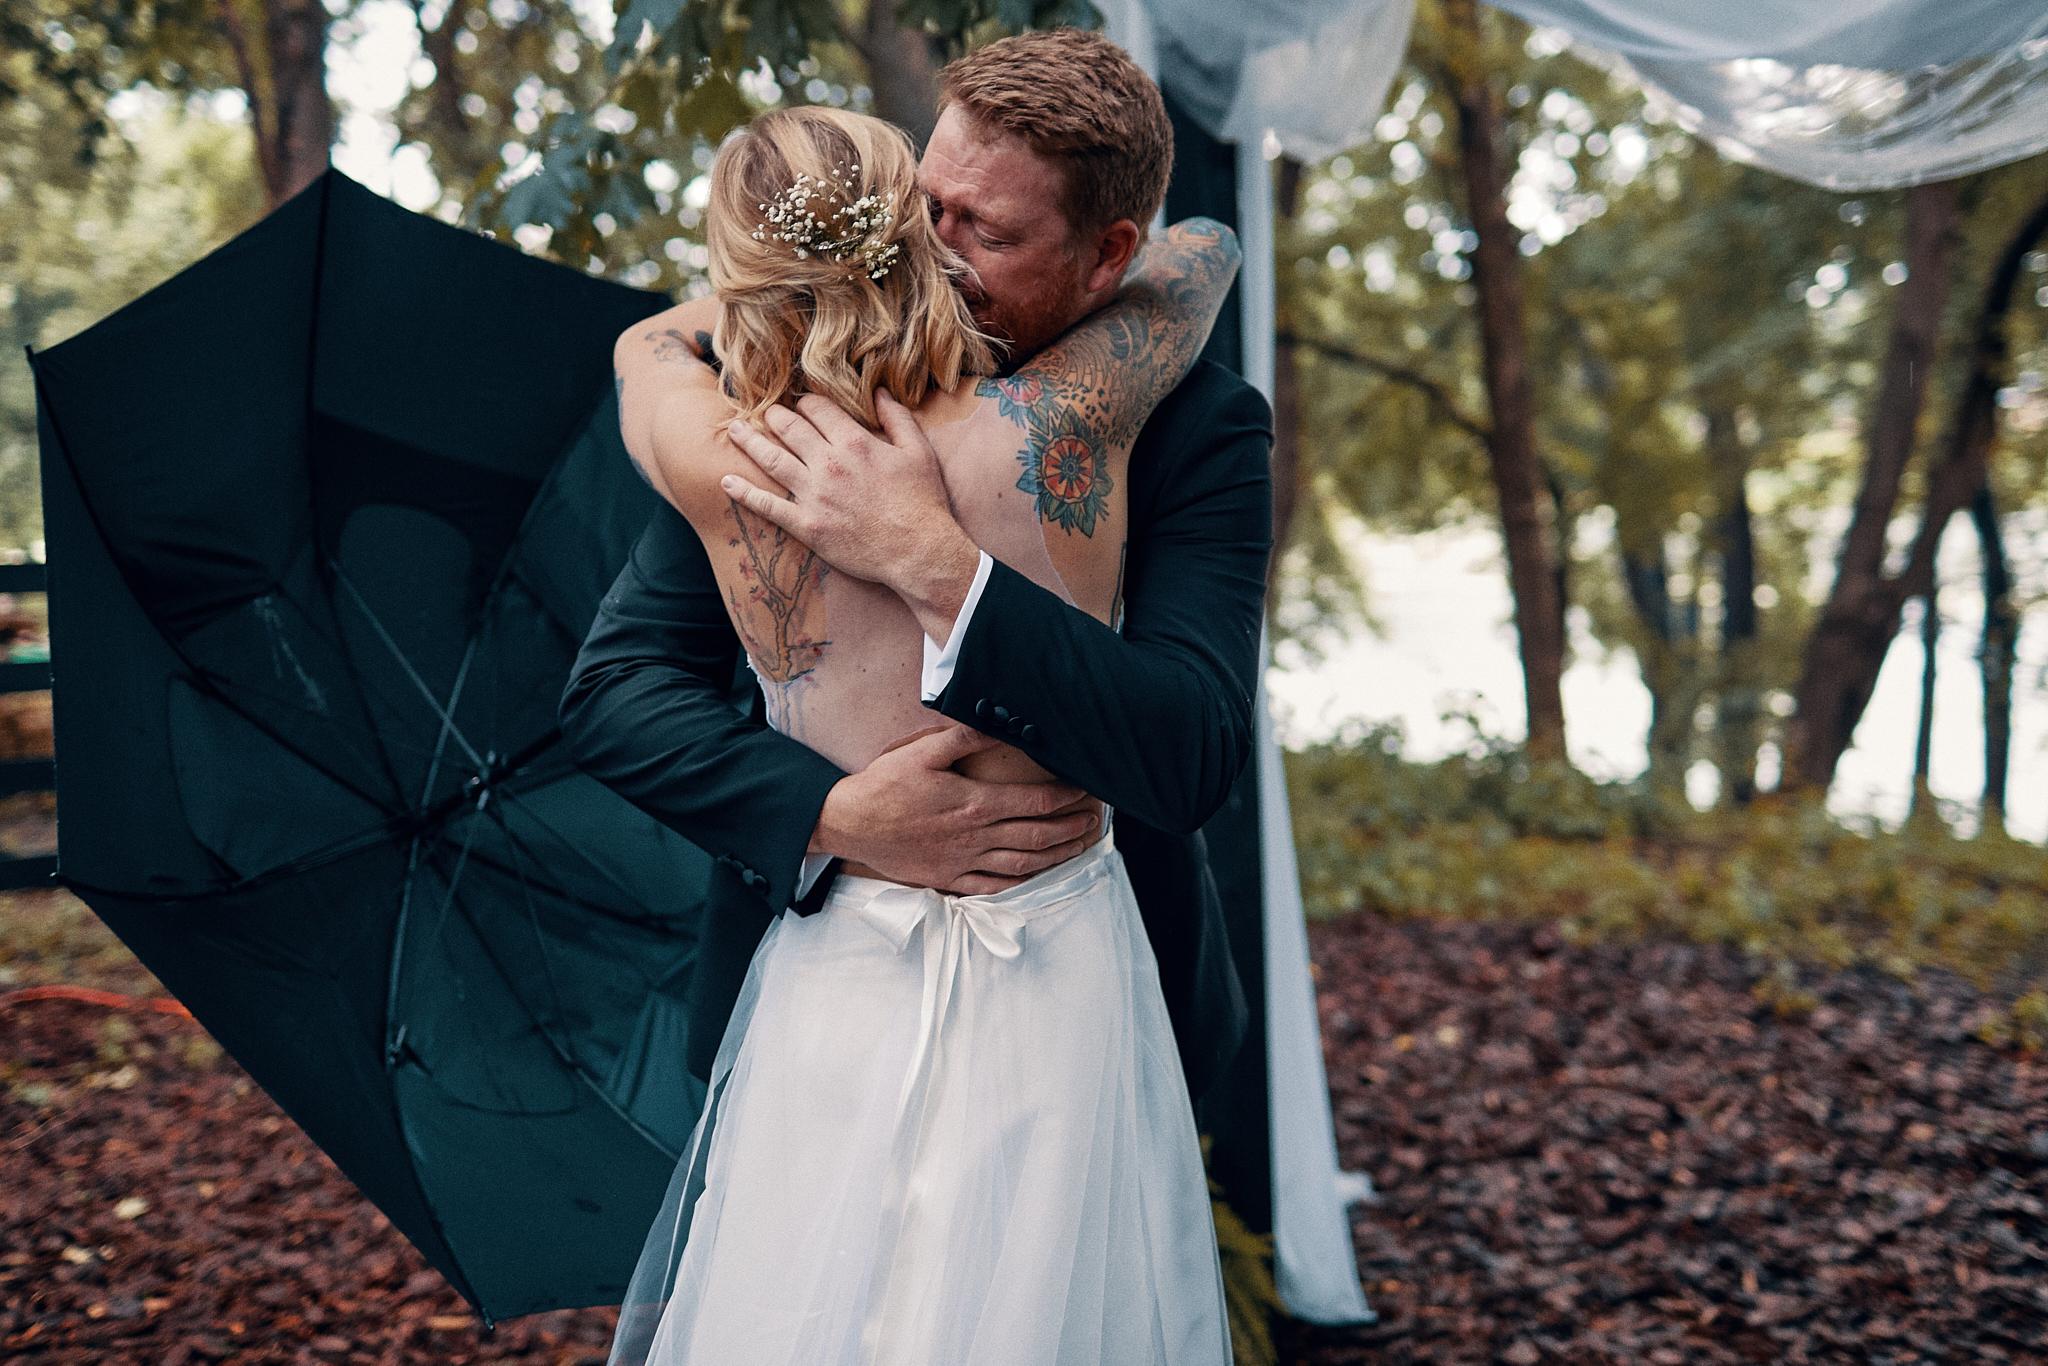 A_Backyard_Wedding_Minneapolis_Wedding_And_Engaement_Photographer_In_Minnesota_High_End_Brand_Something_Candid_002.JPG